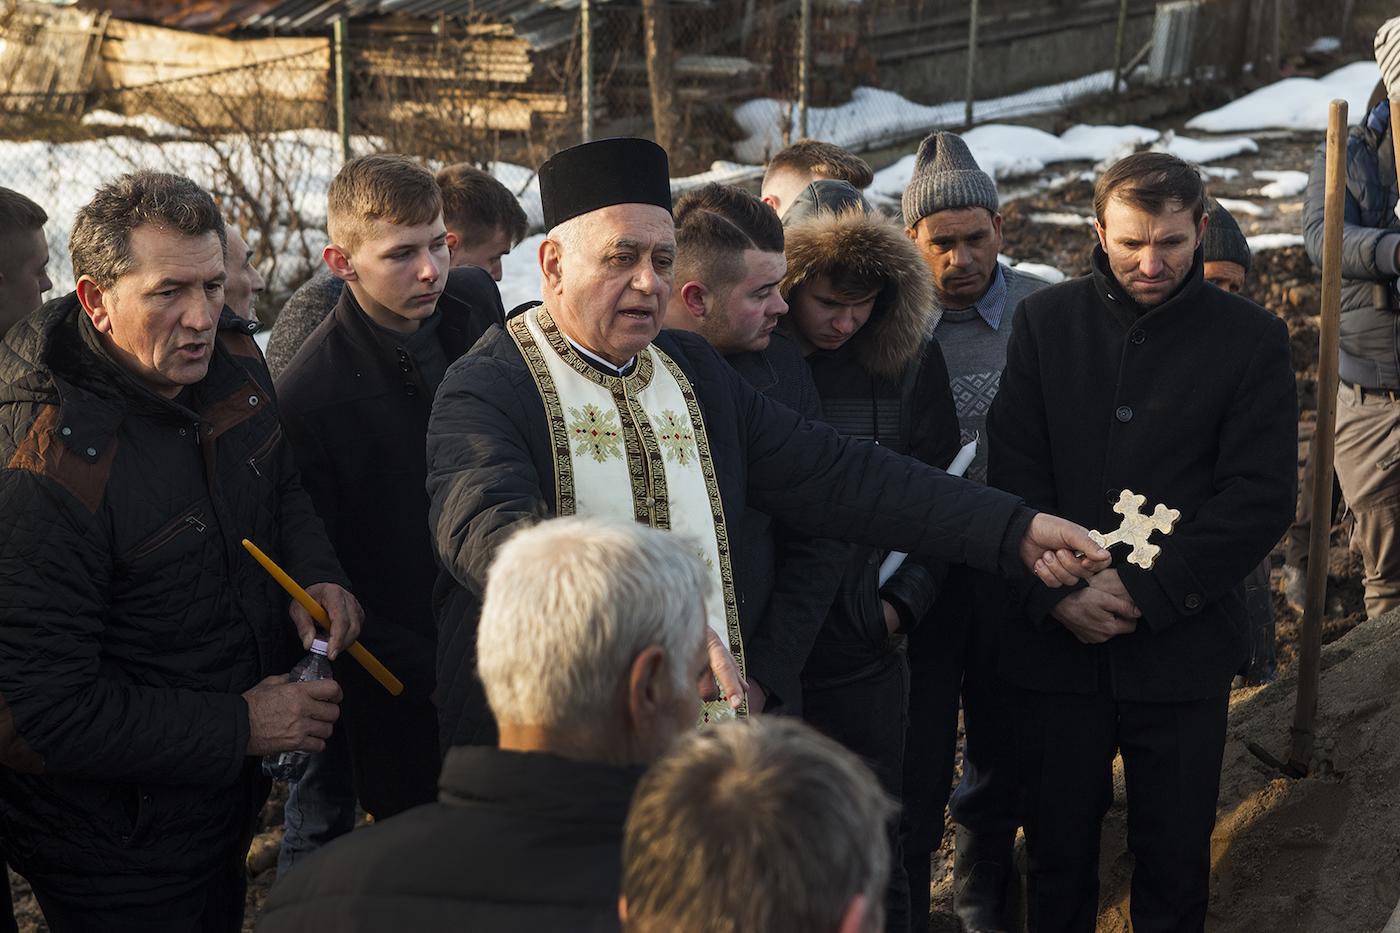 Pastor Luțai membacakan doa.